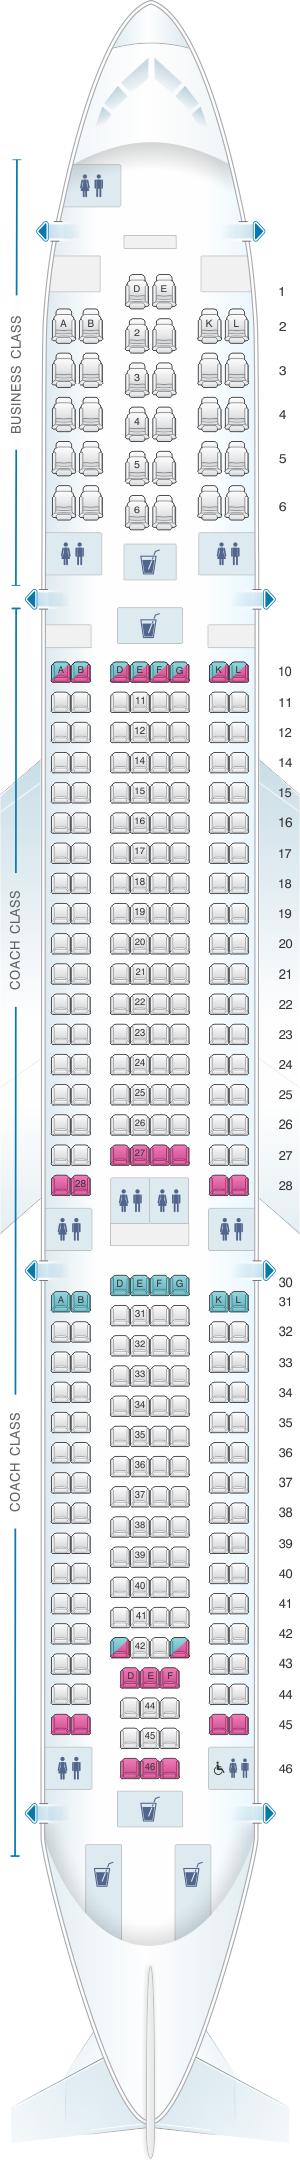 Seat map for Air Tahiti Nui Airbus A340 300